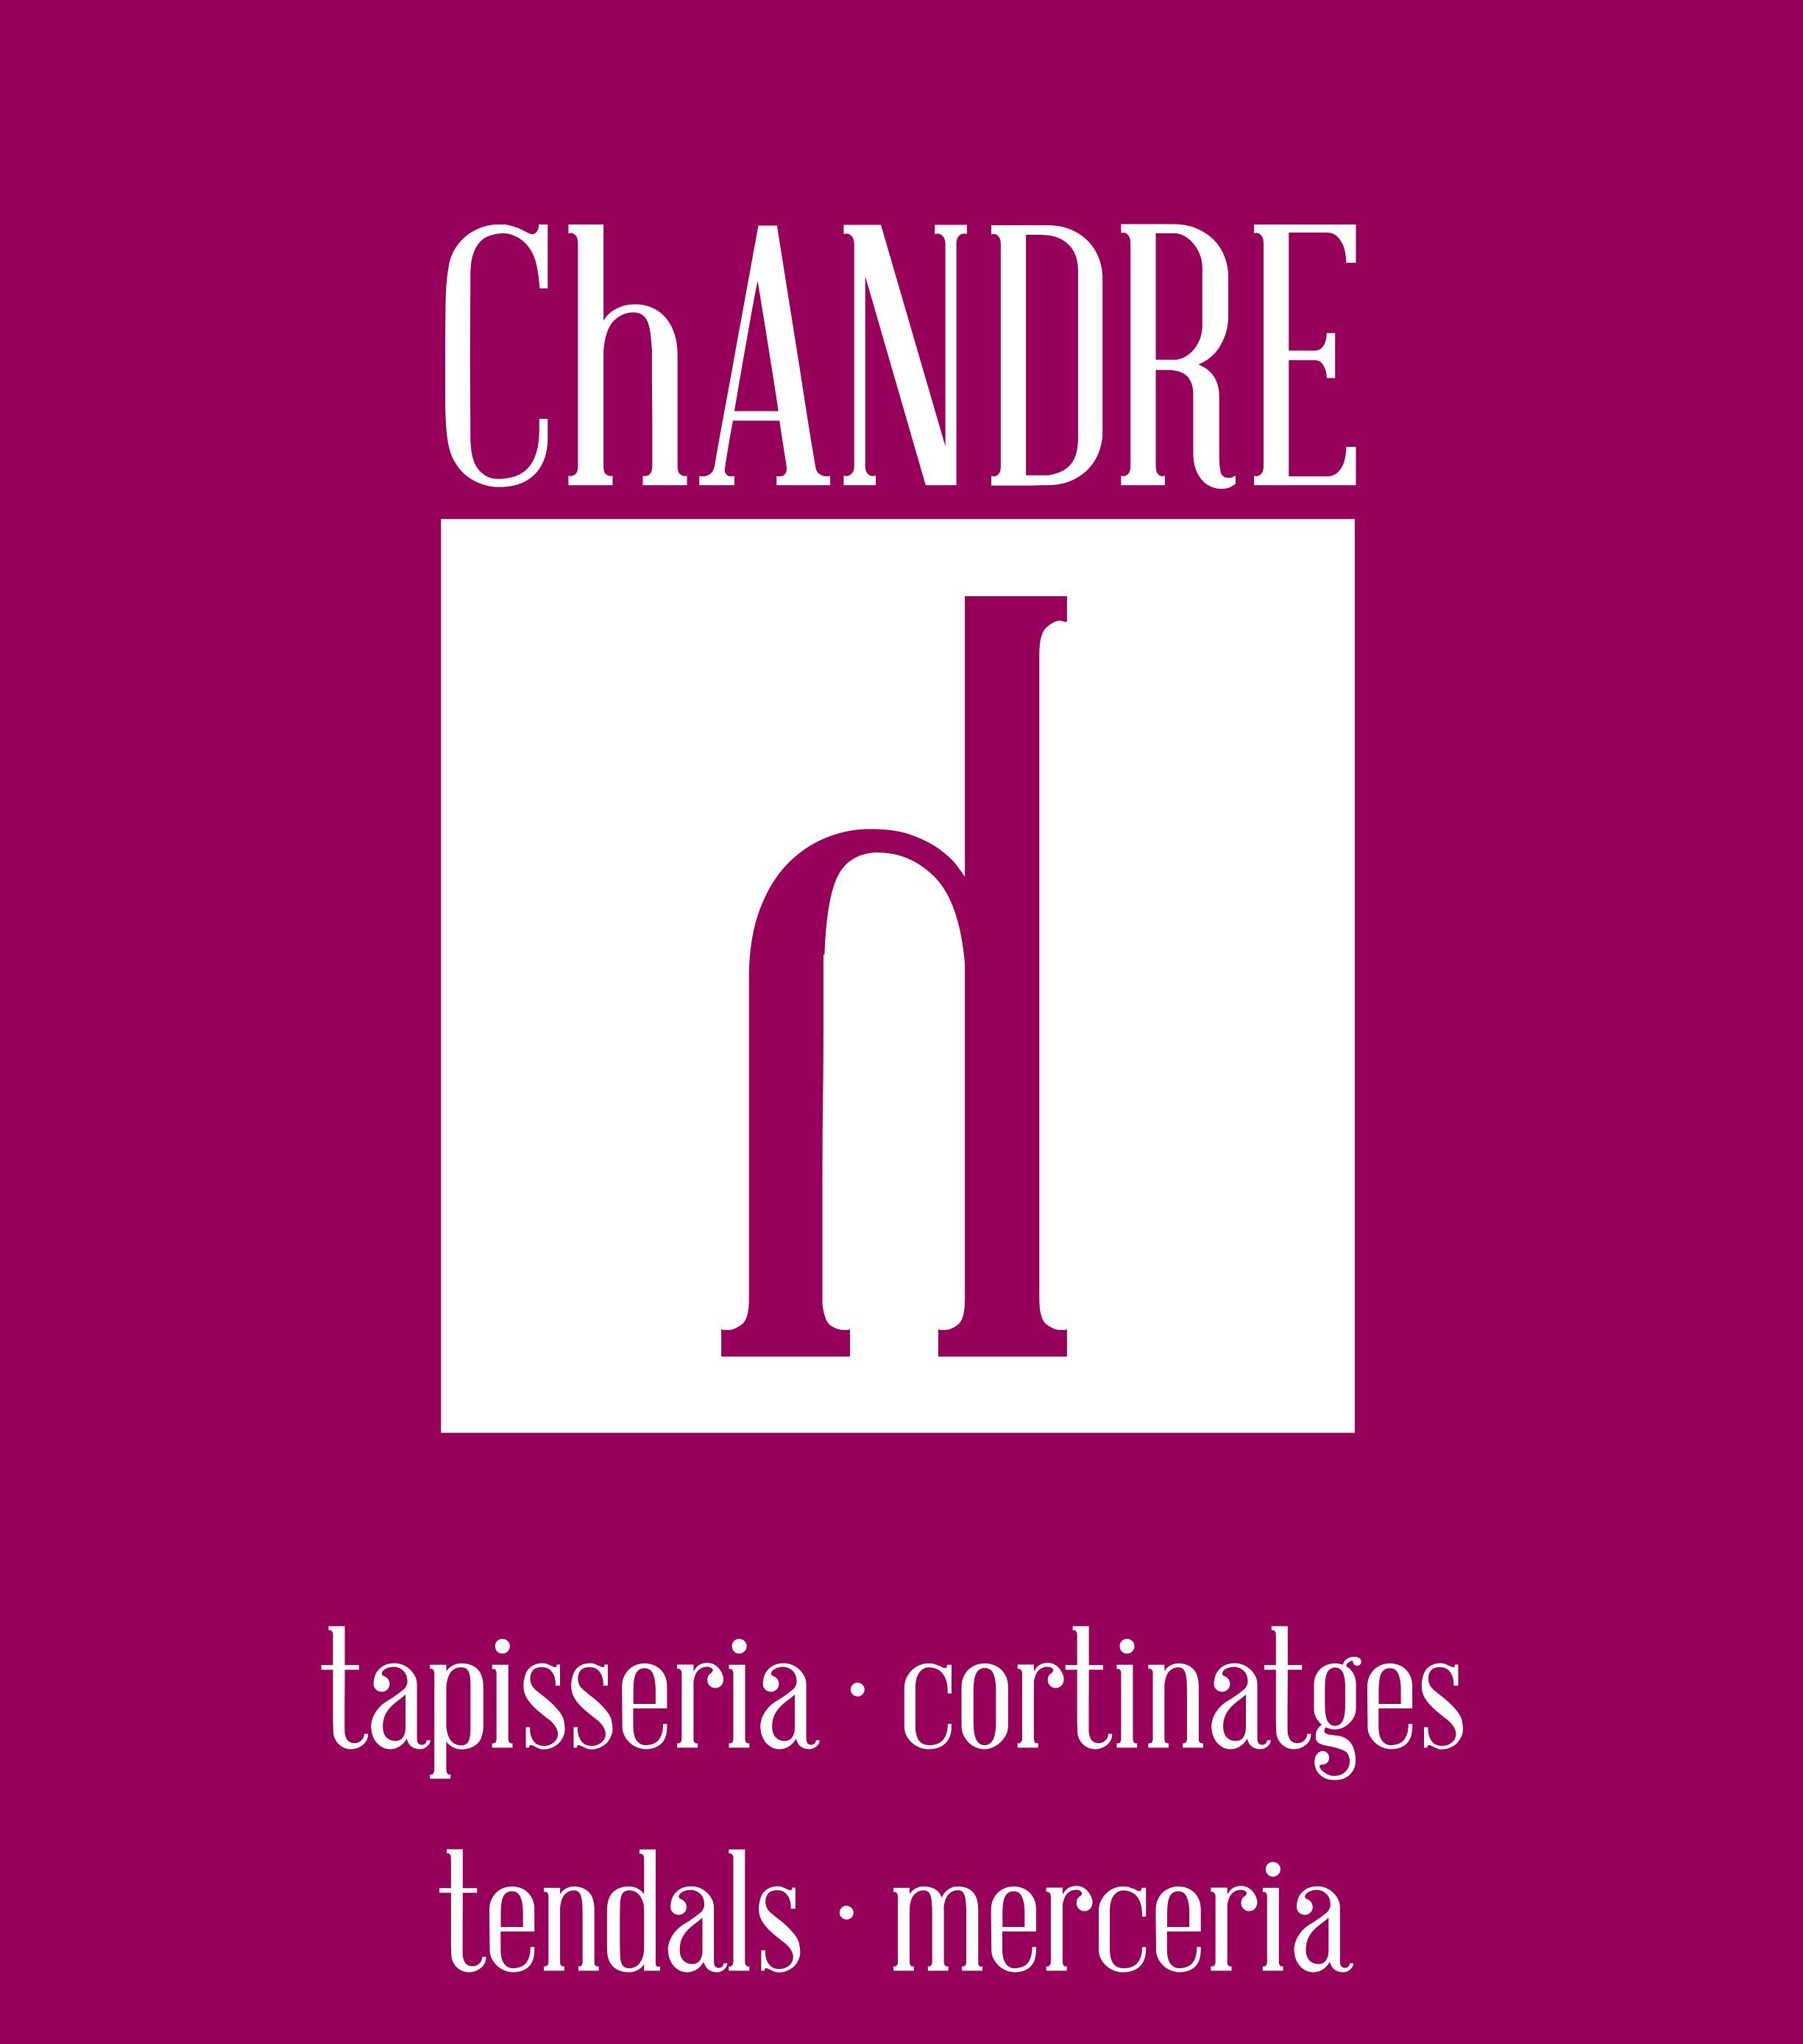 TAPISSERIA CHANDRE